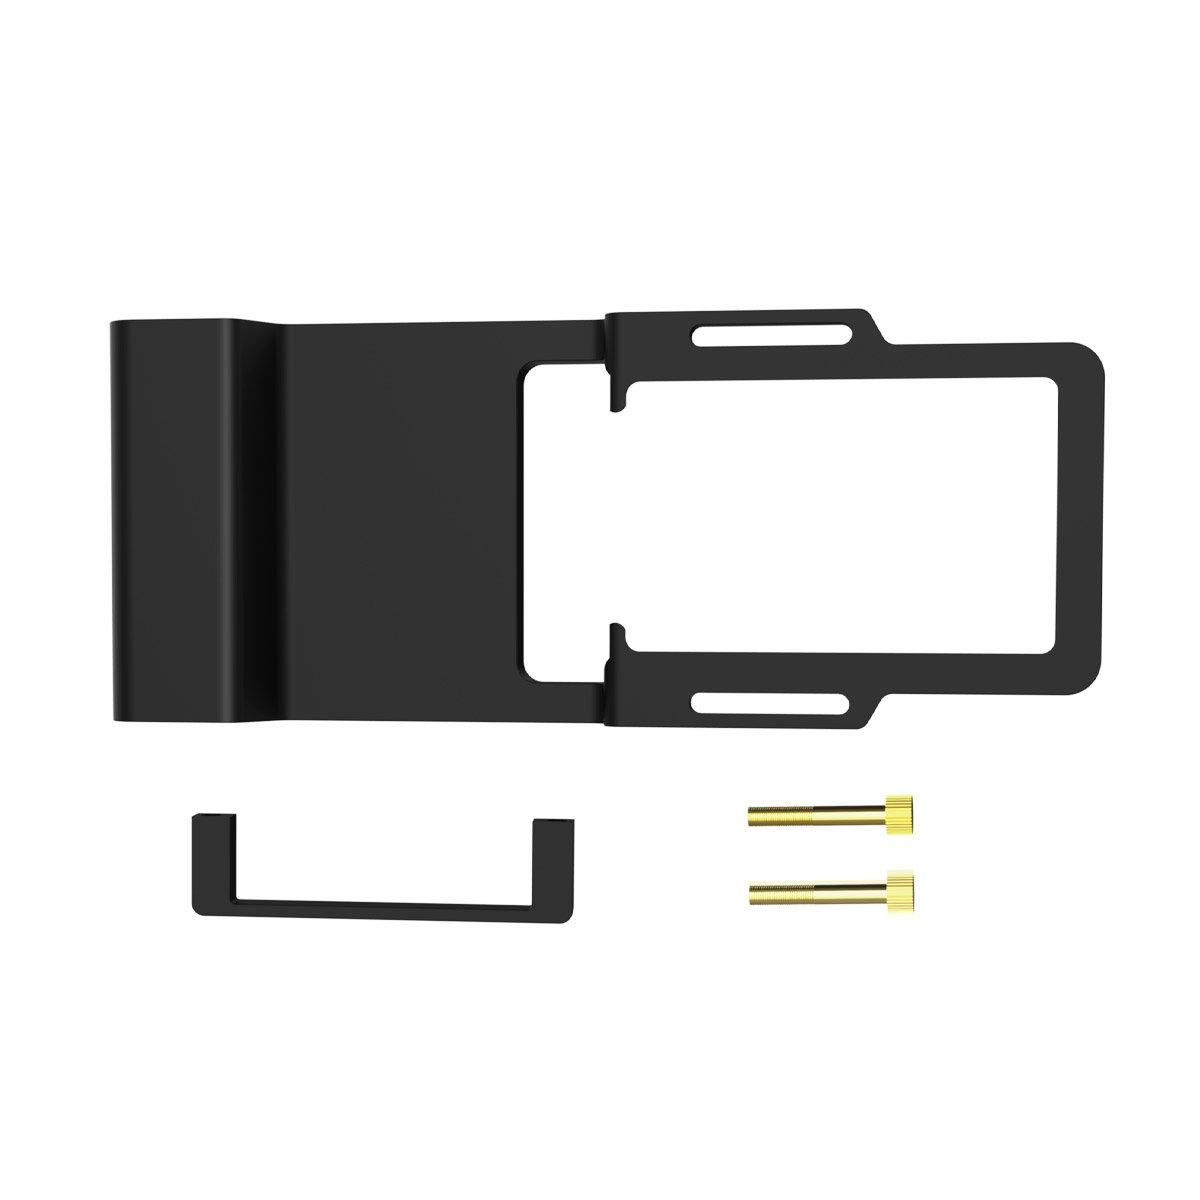 Boge Adattatore Piastra di Montaggio, Solido Handheld Gimbal Mounnt Adattatore per GoPro Hero 6/5/4/3 +, Zhiyun Smooth Q, e DJI Osmo, Nero